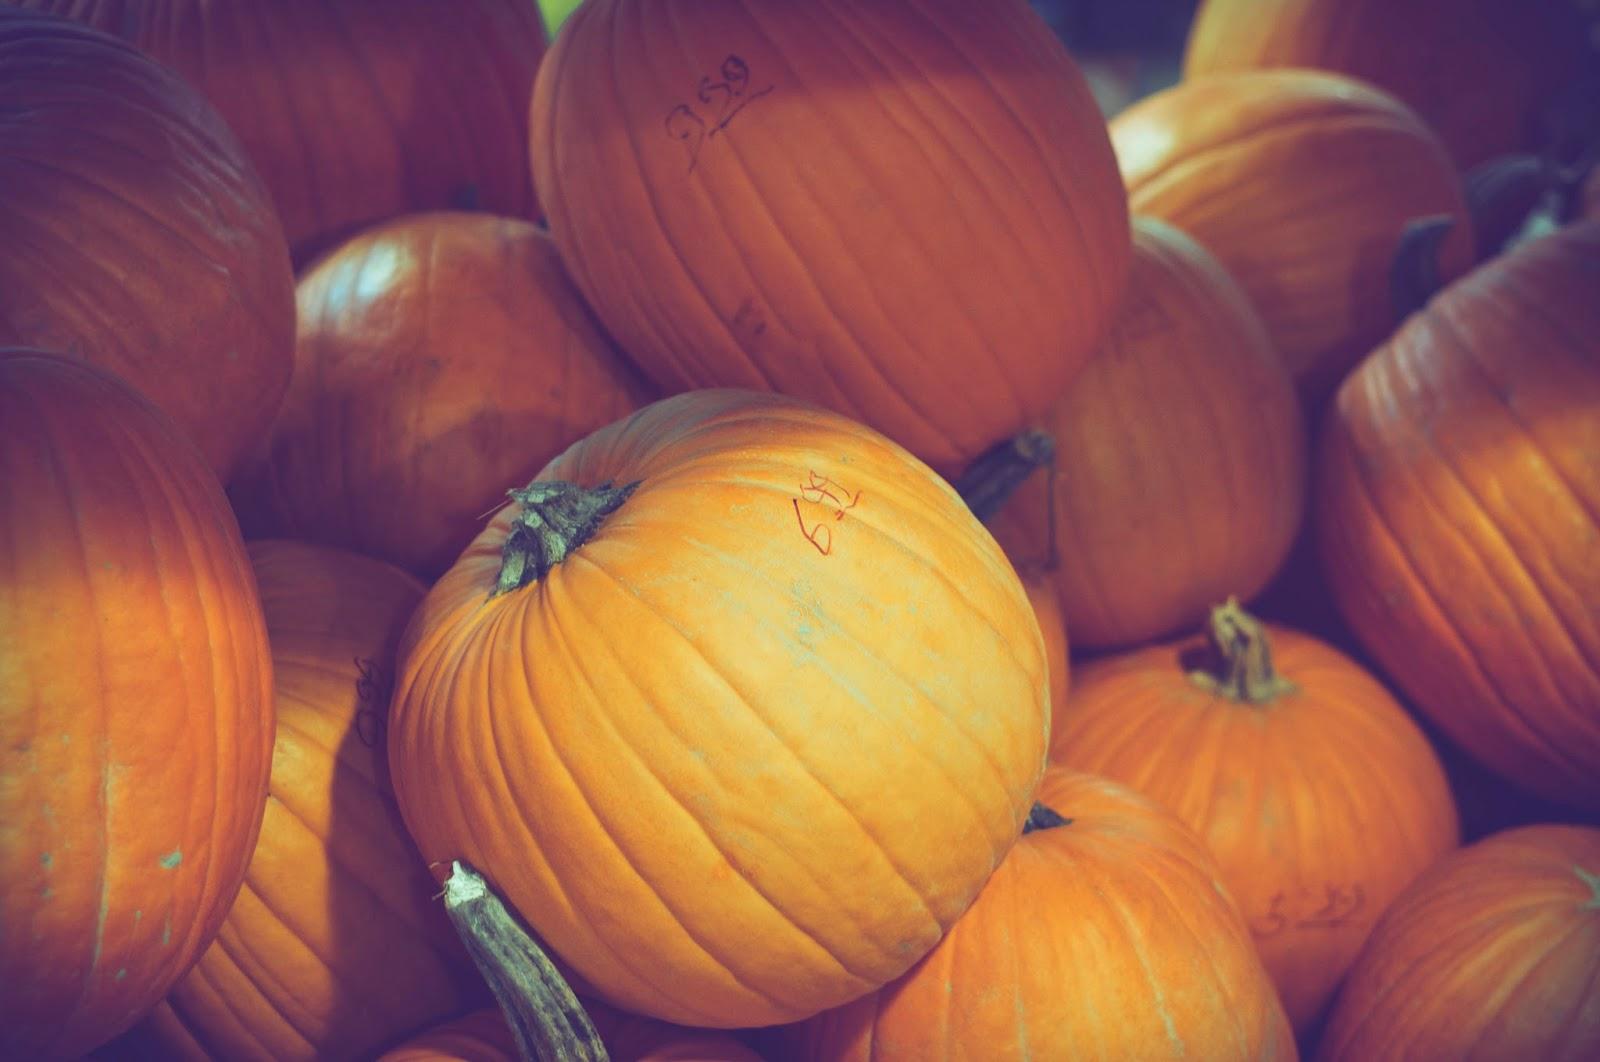 pumpkinsin granville market, vancouver